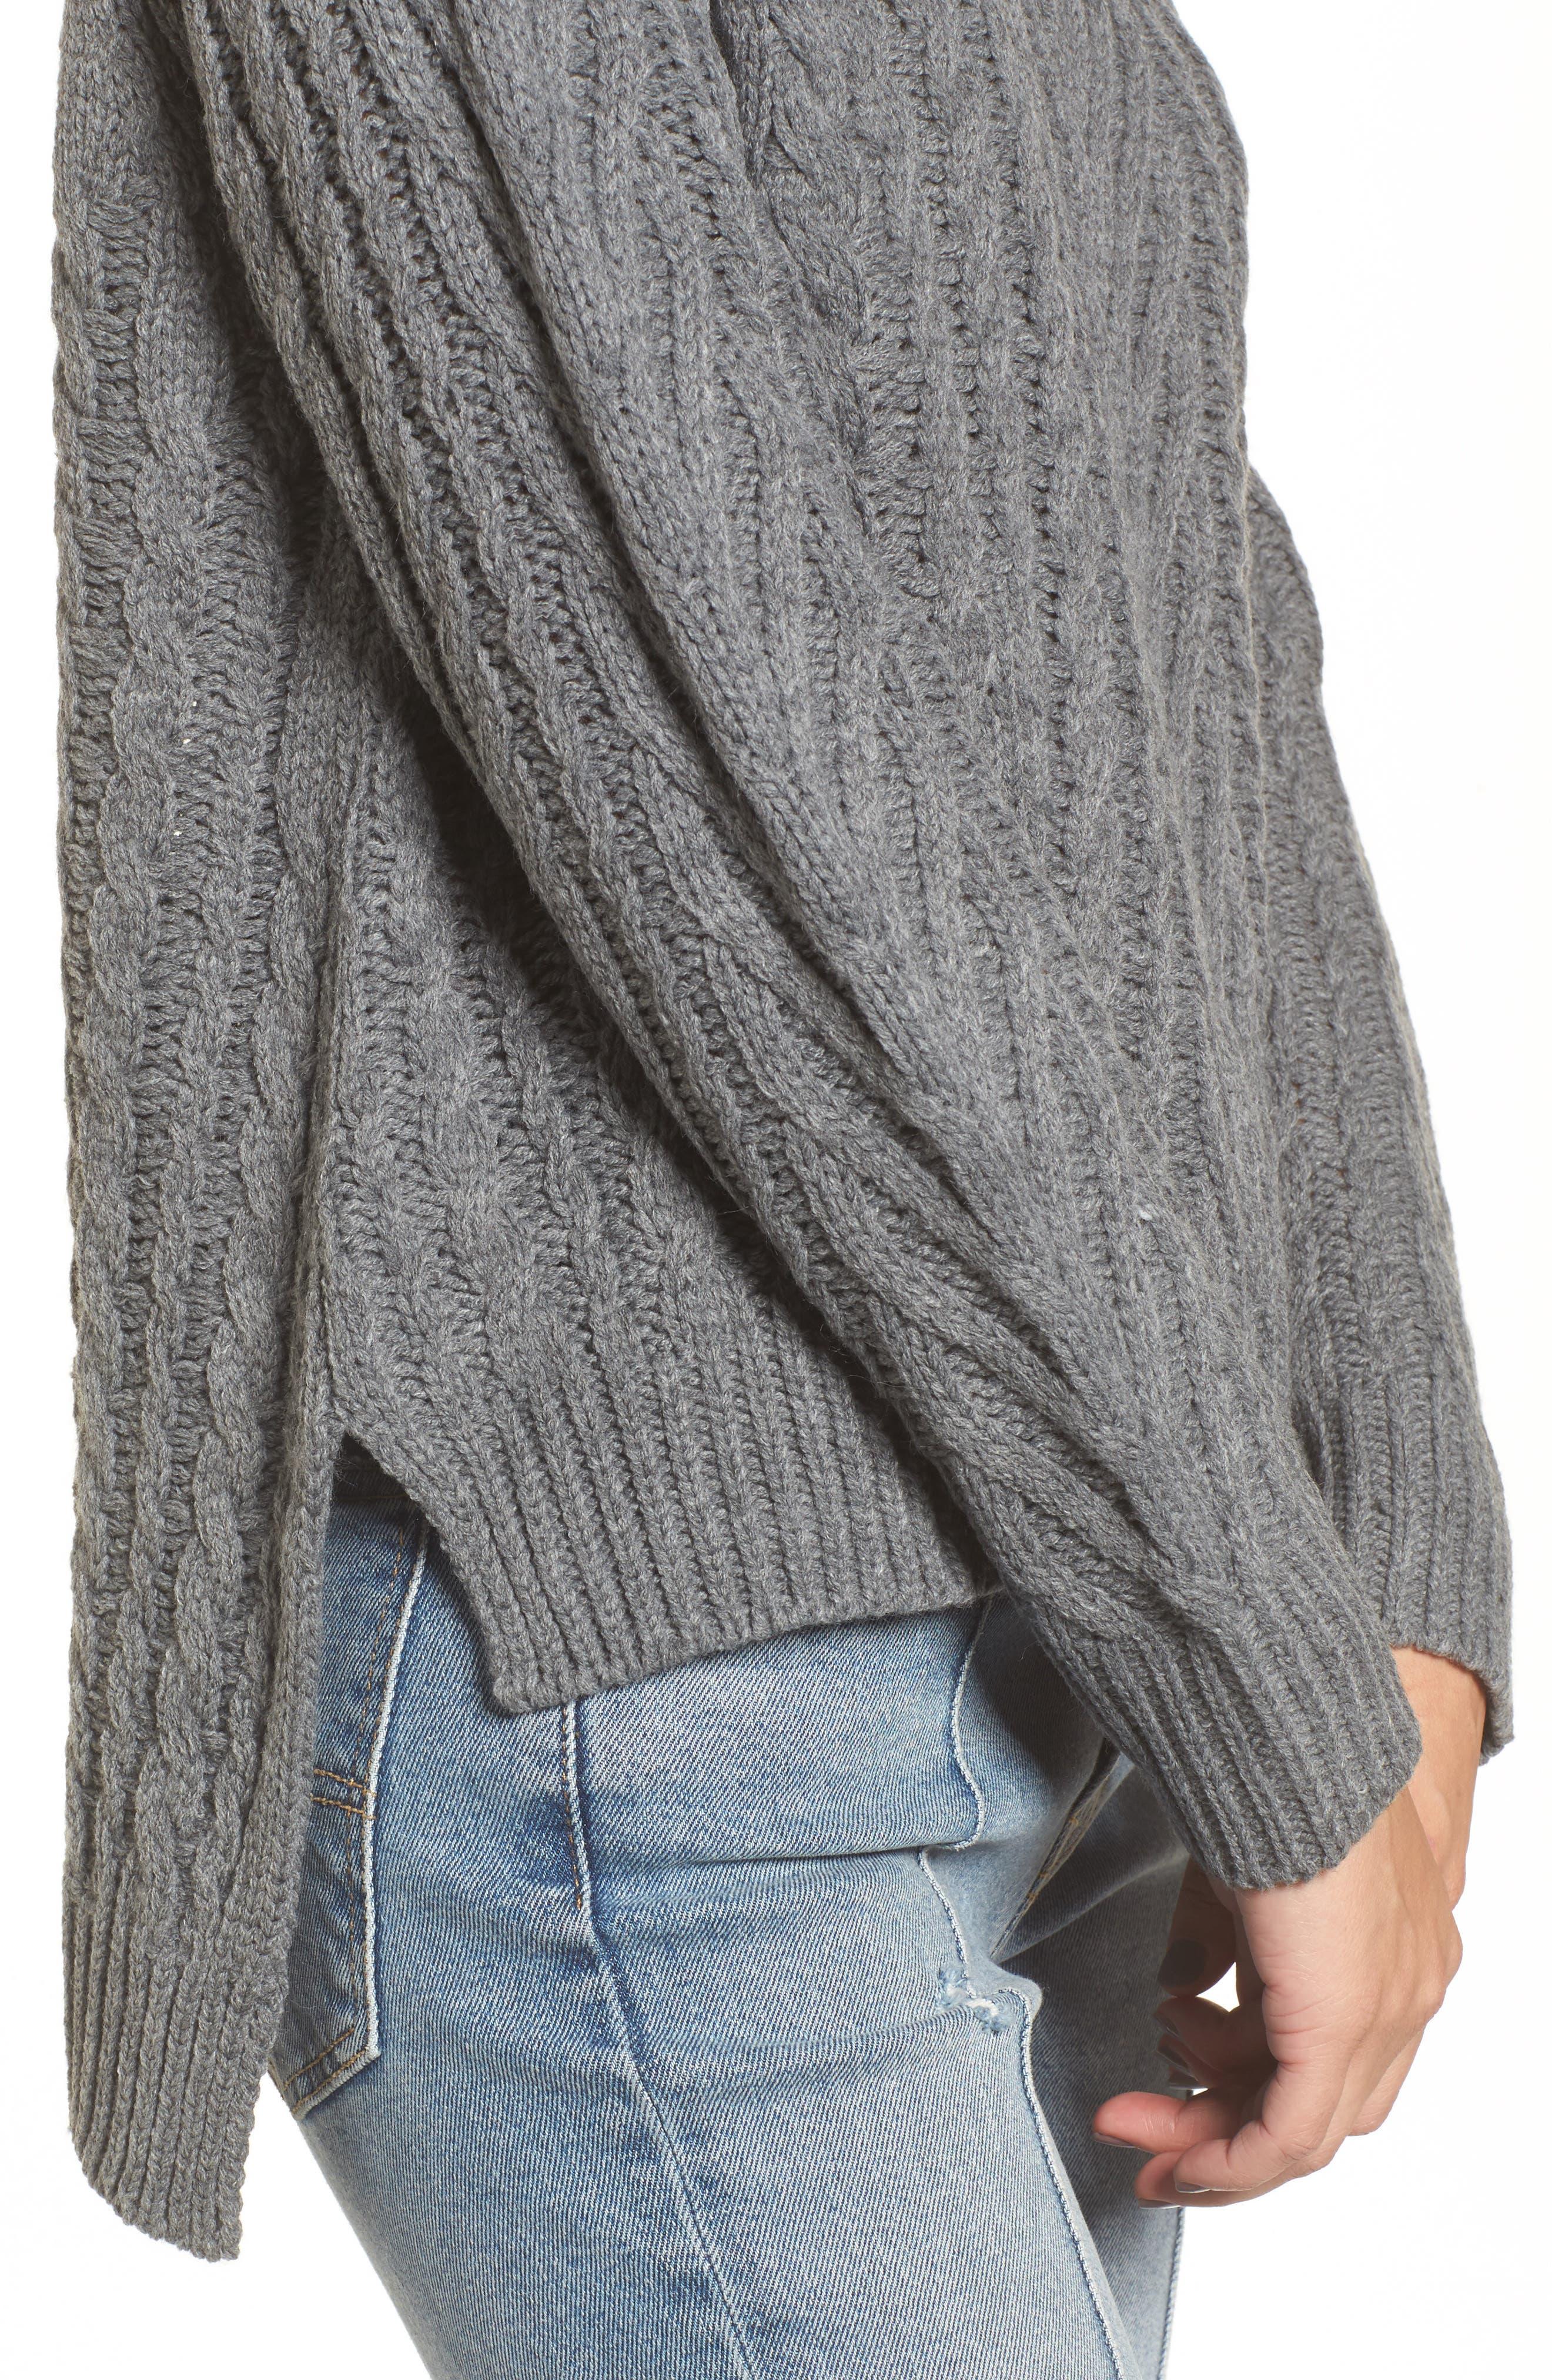 Cable Knit Turtleneck Sweater,                             Alternate thumbnail 4, color,                             020